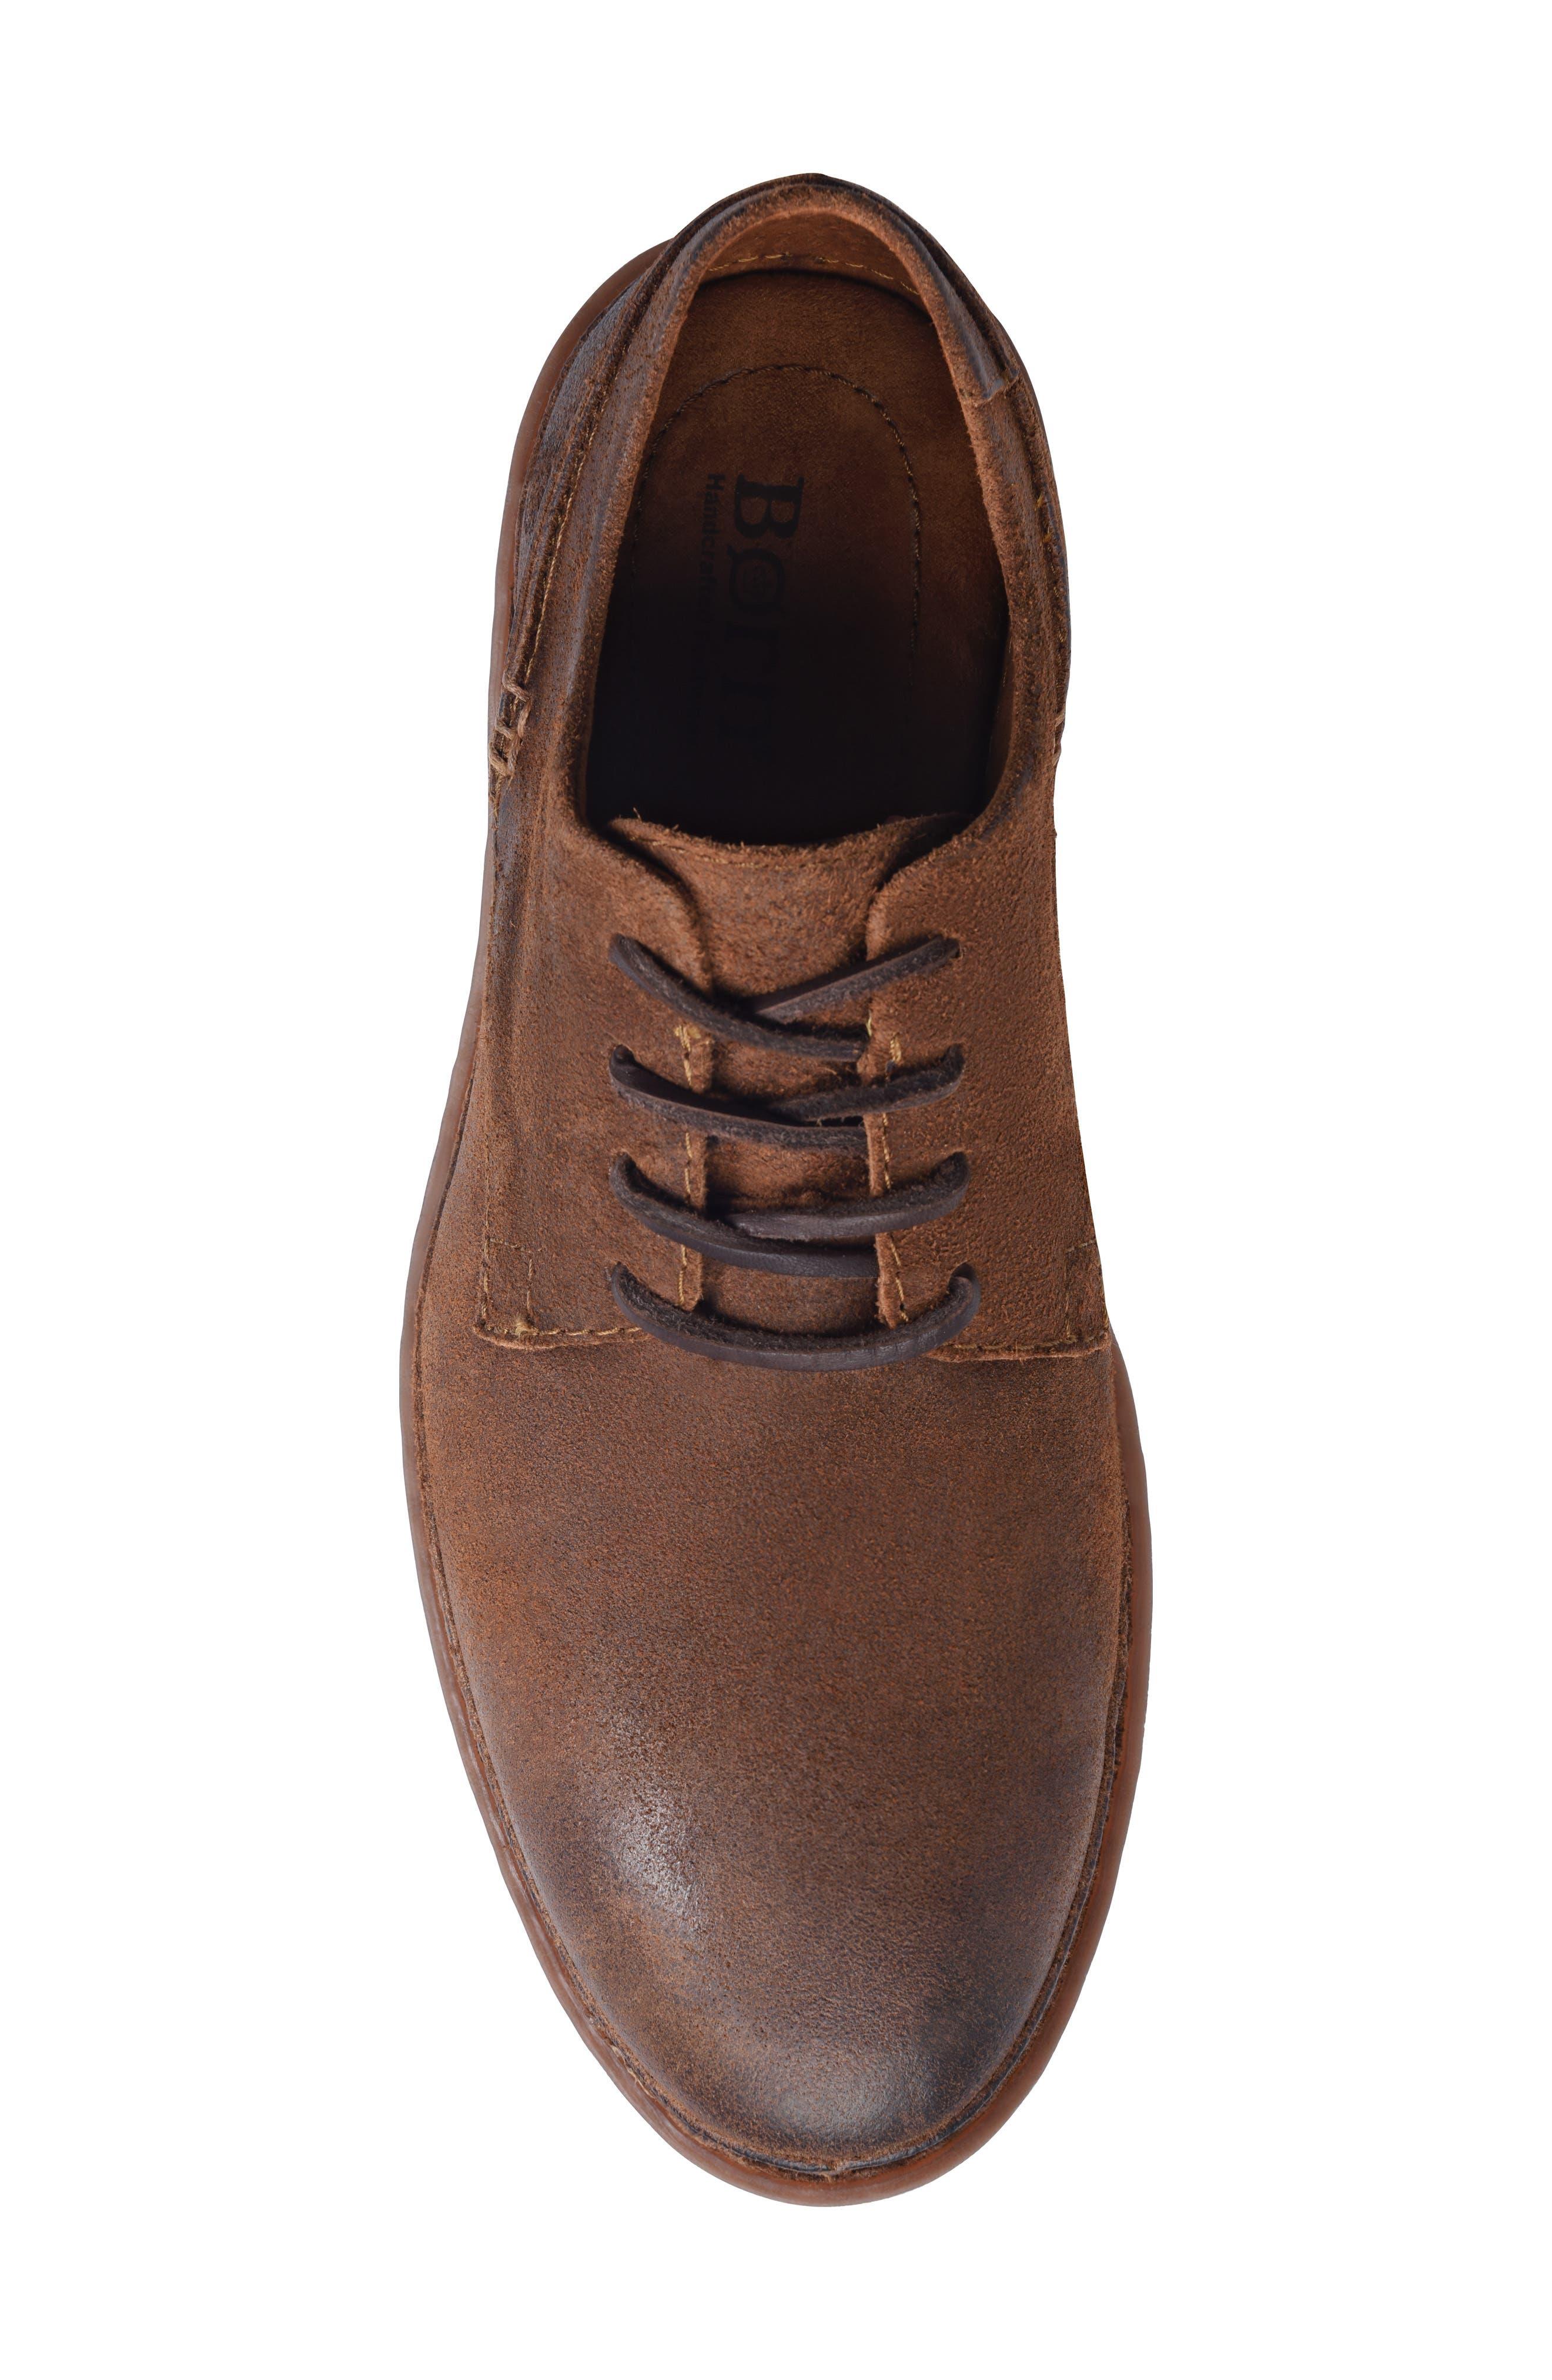 Gilles Plain Toe Derby,                             Alternate thumbnail 4, color,                             Brown/Brown Leather